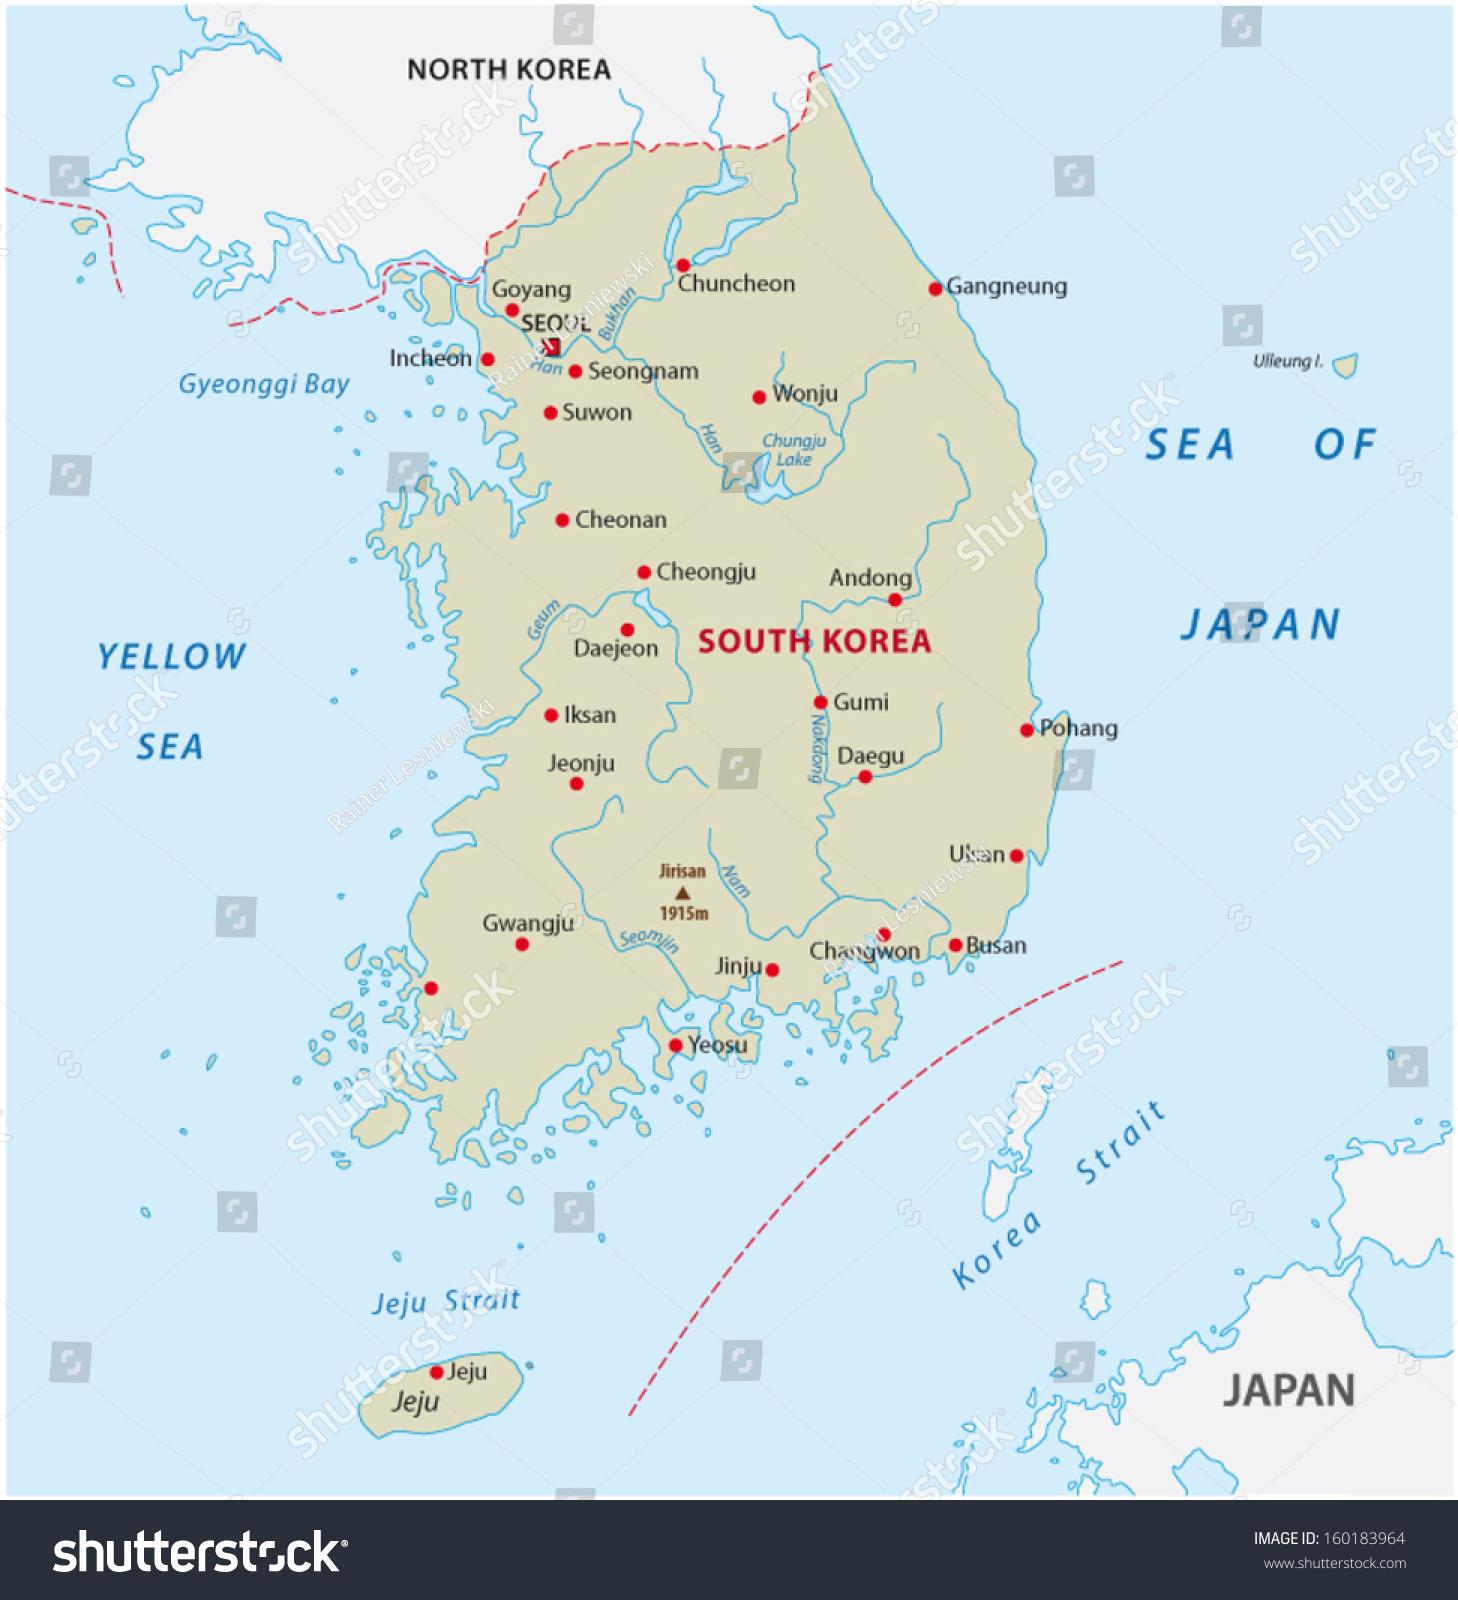 South Korea Map Stock Vector (Royalty Free) 160183964 - Shutterstock